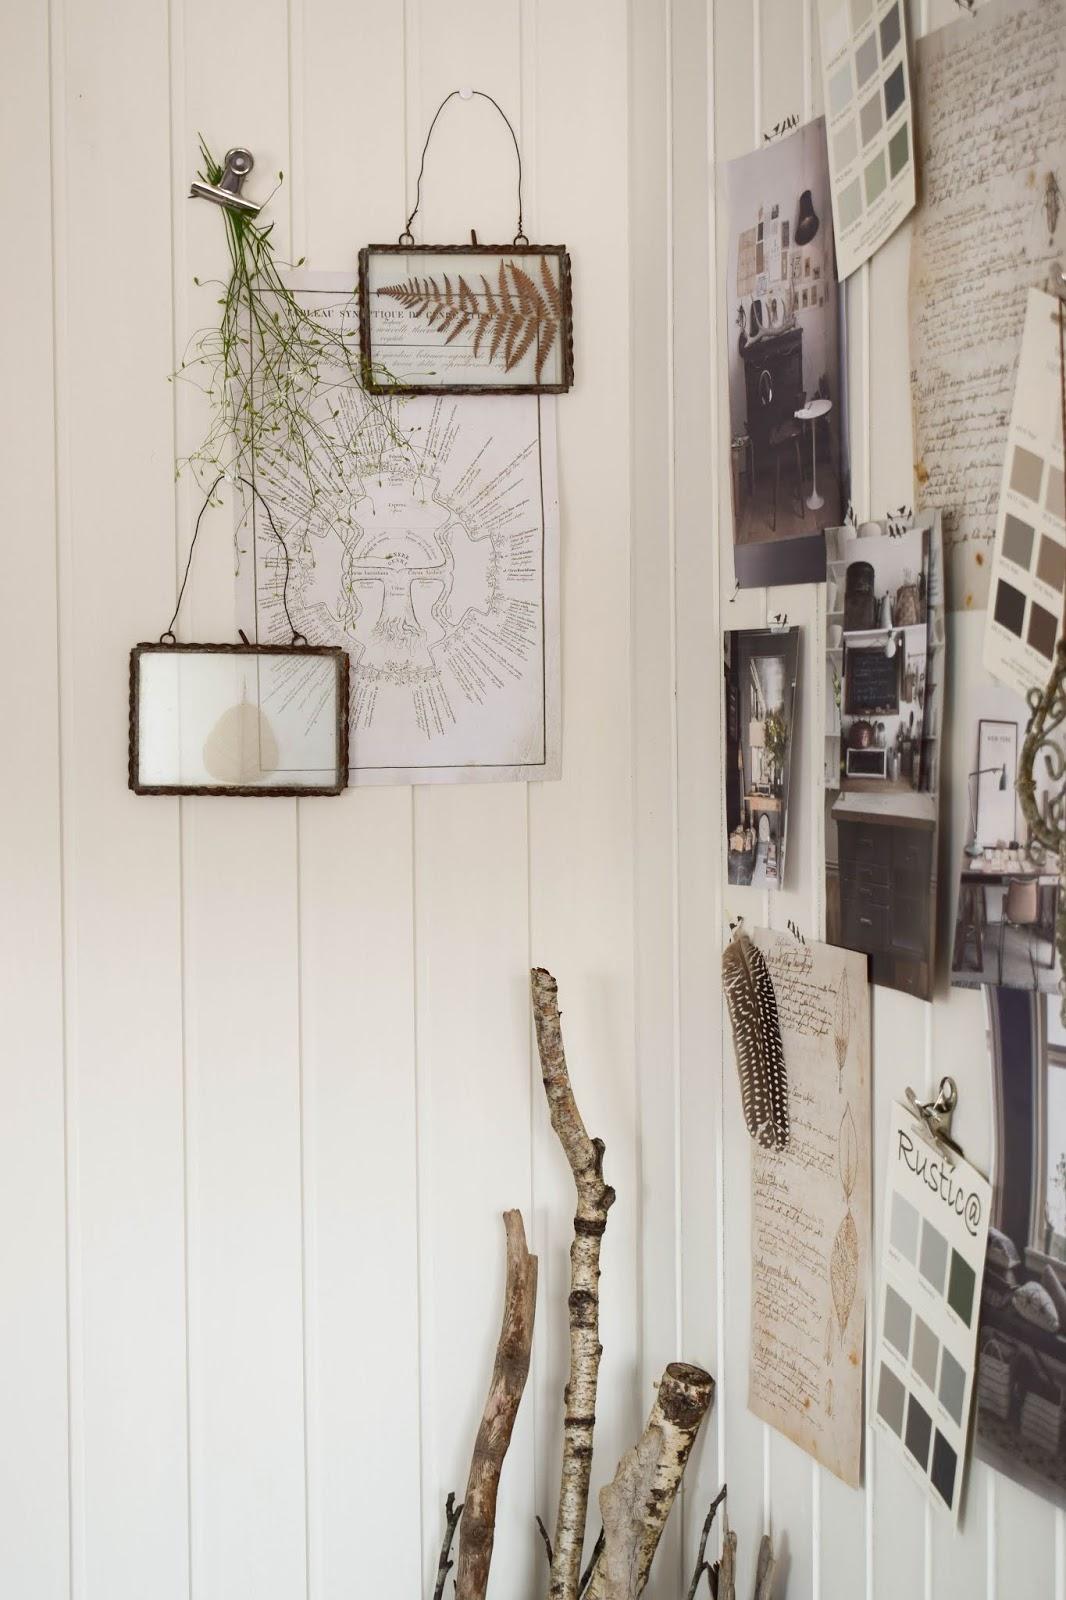 Dekoidee Wandverkleidung DIY Aus Holz Moodboard Inspirationswand  Kreidefarbe Von Painting The Past Vertaefelung Beadboard Selber Machen